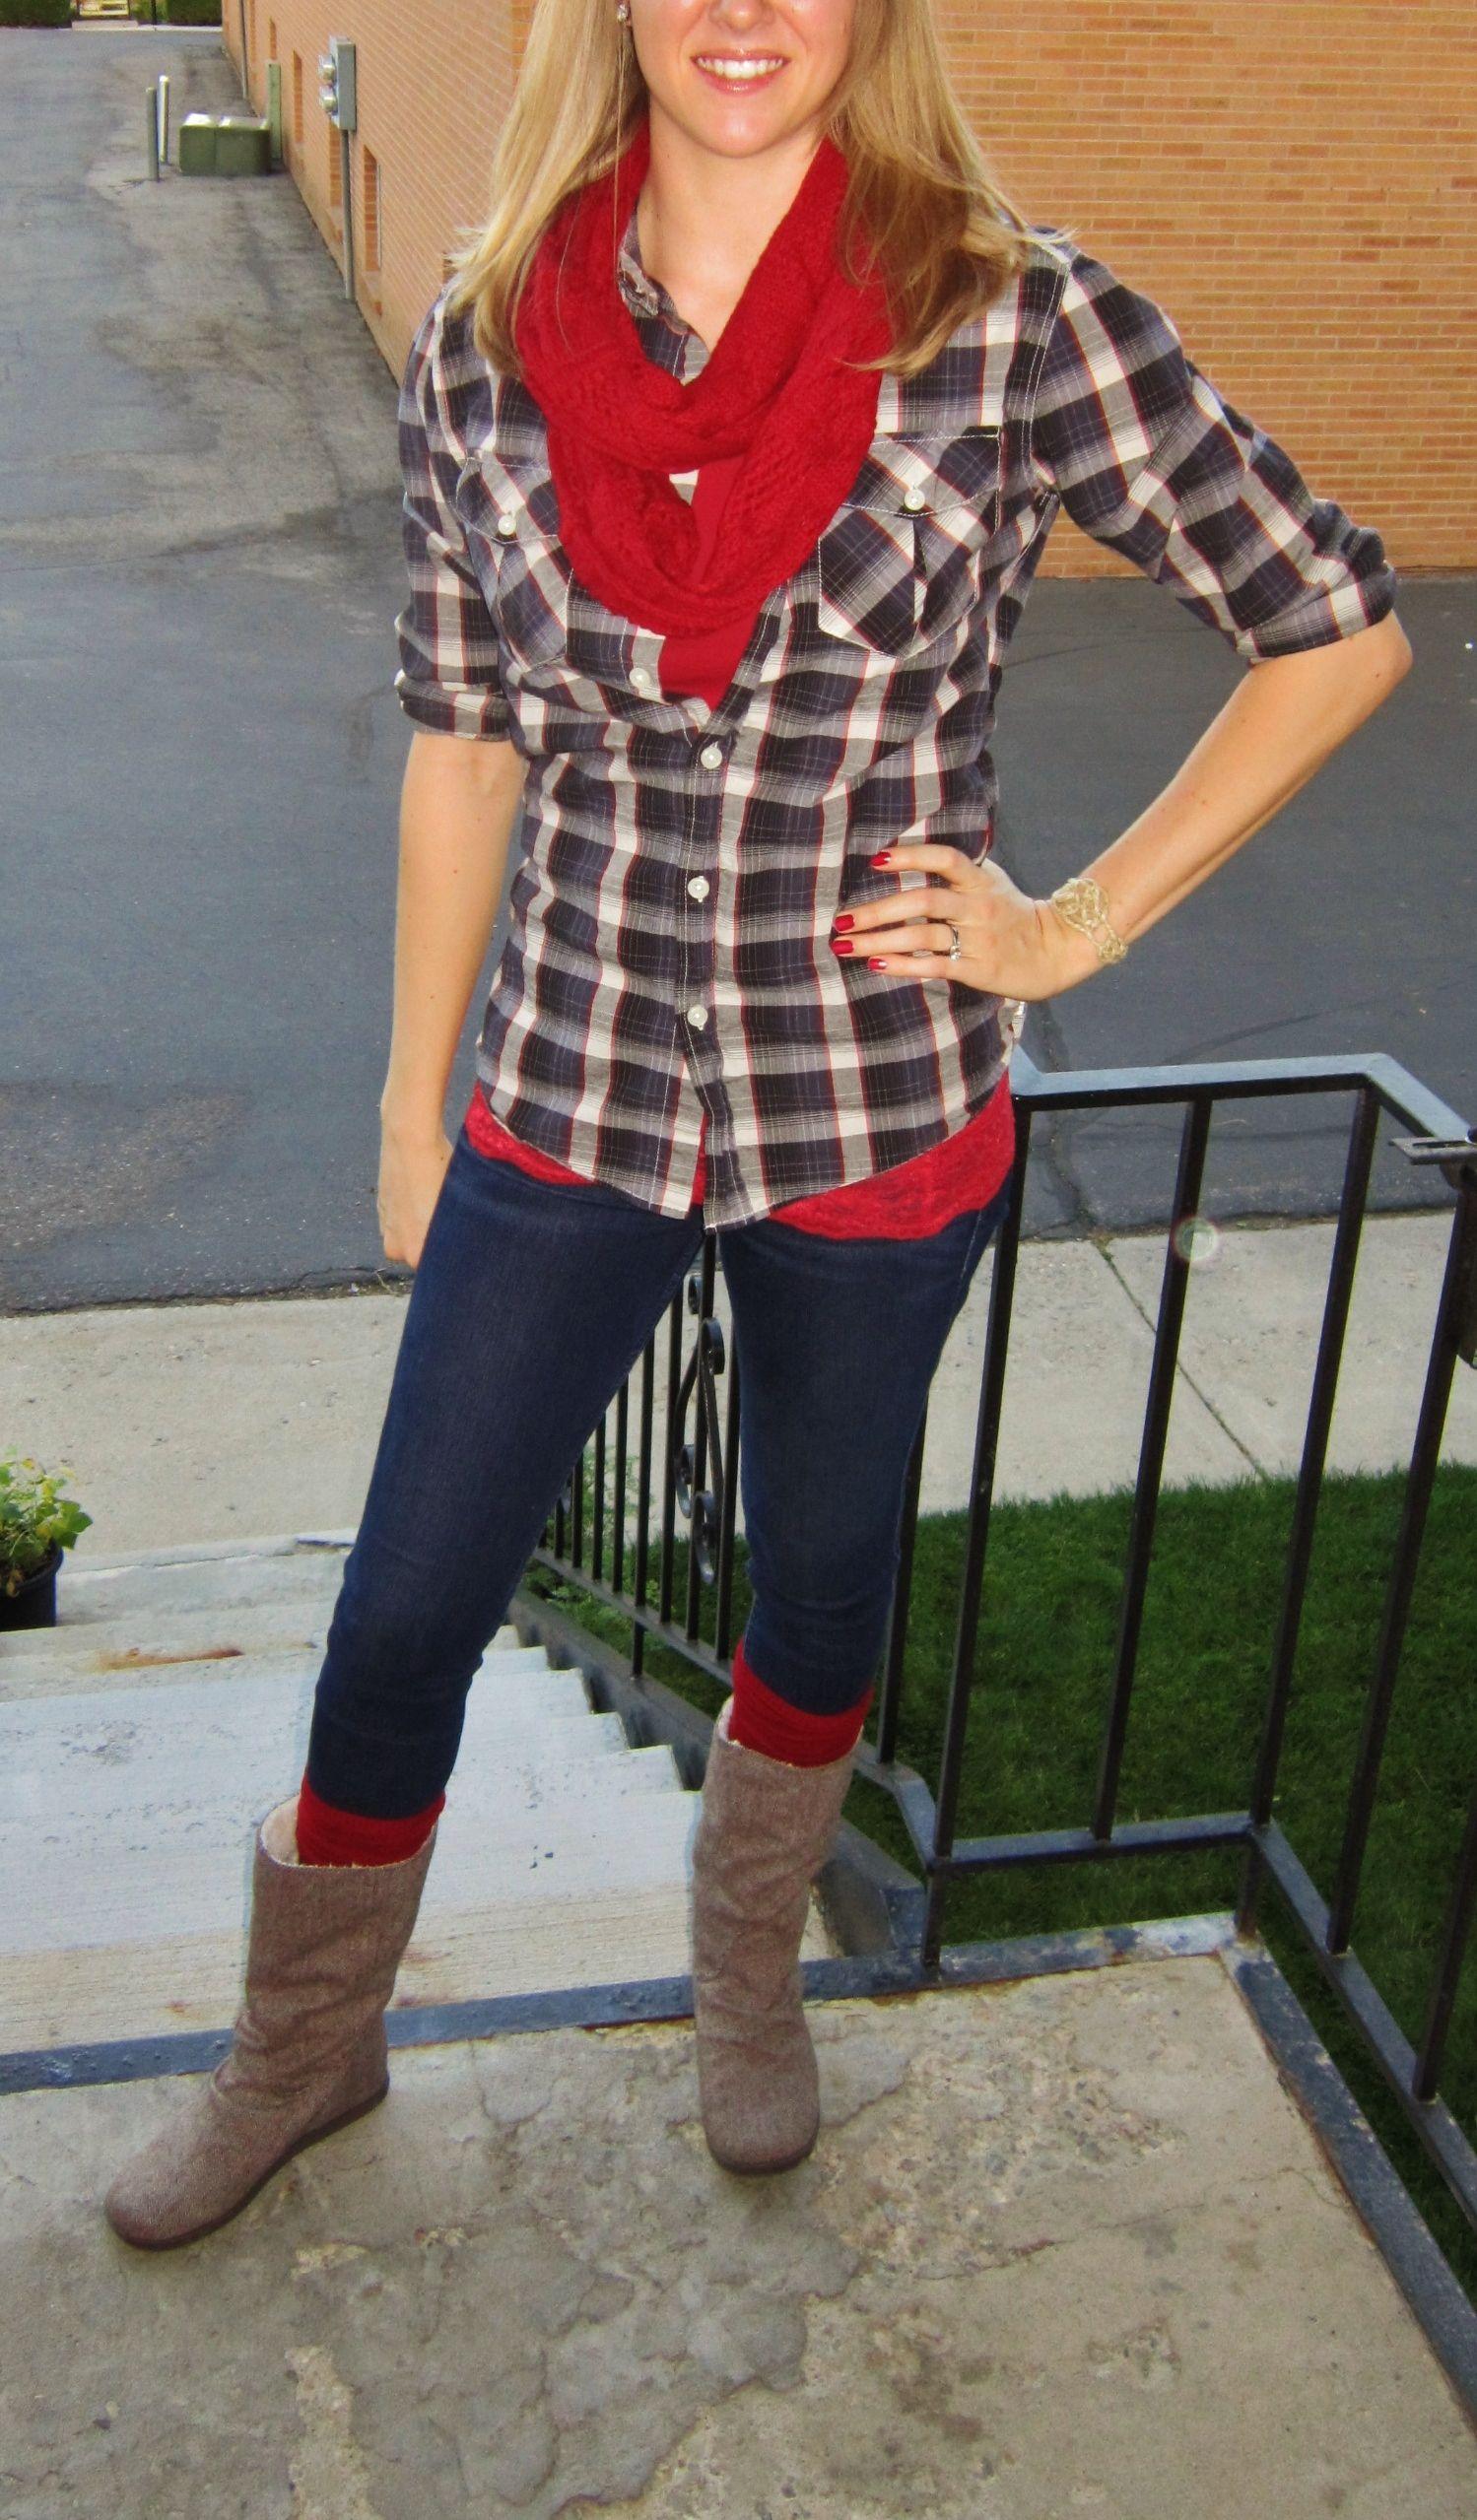 Red and black flannel cardigan  Plaid shirt husbandustaken in u darted Skinny jeans Holister